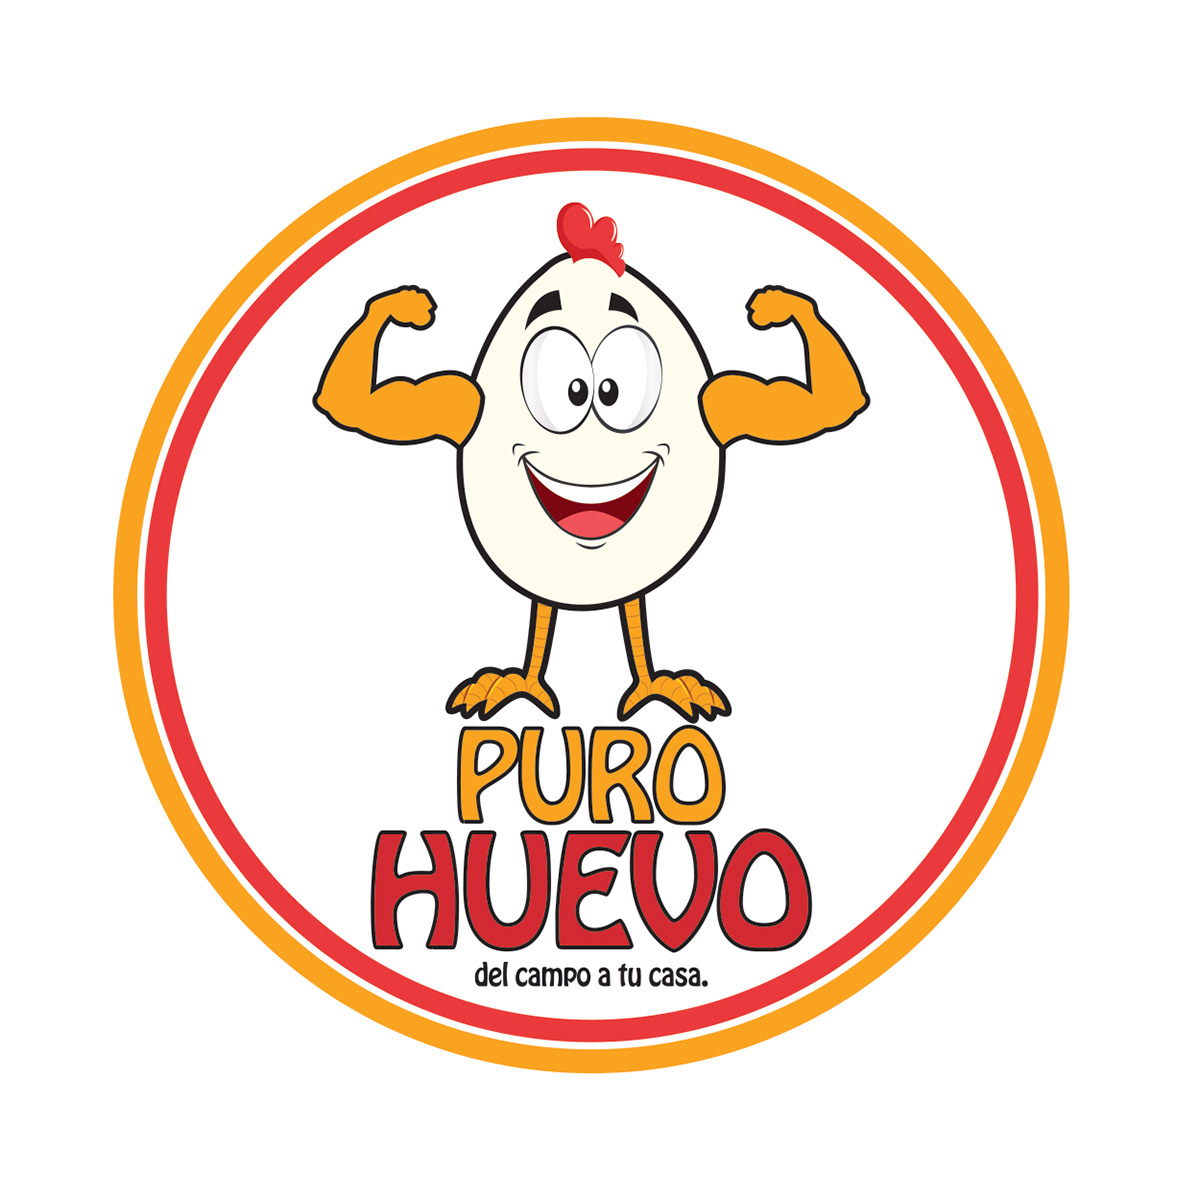 brand huevos logo marca tucuman